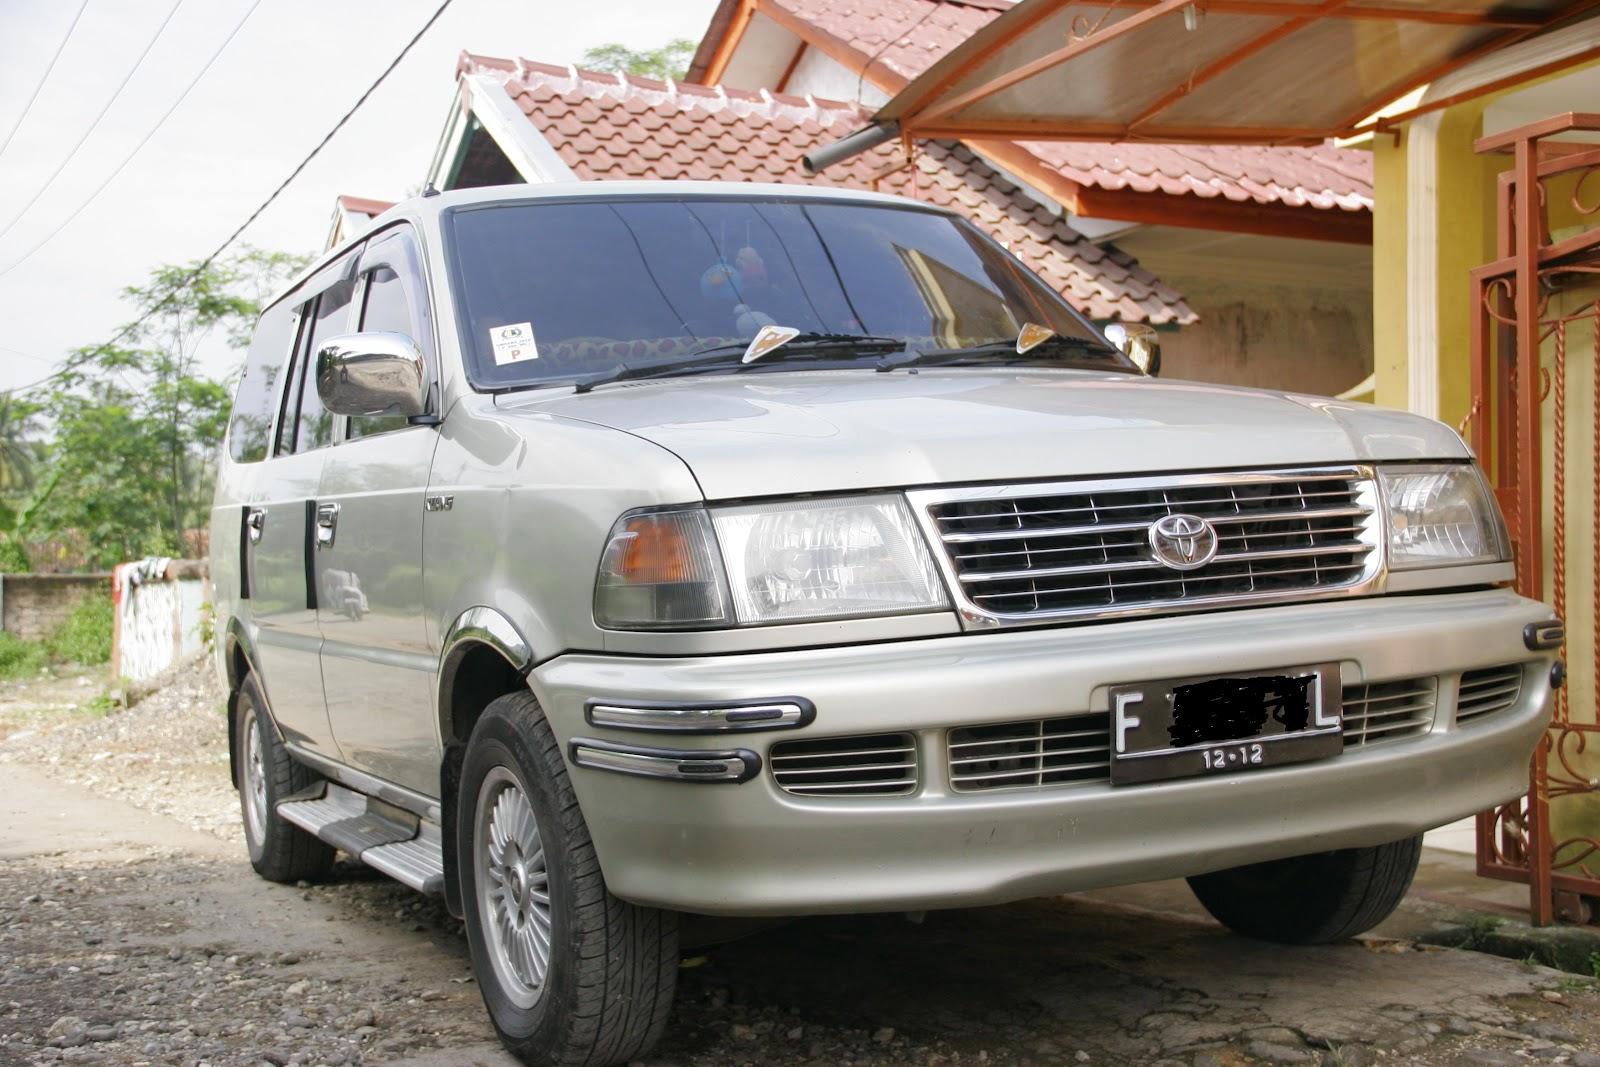 kelebihan dan kekurangan all new kijang innova diesel modifikasi interior kapsul standar holidays oo